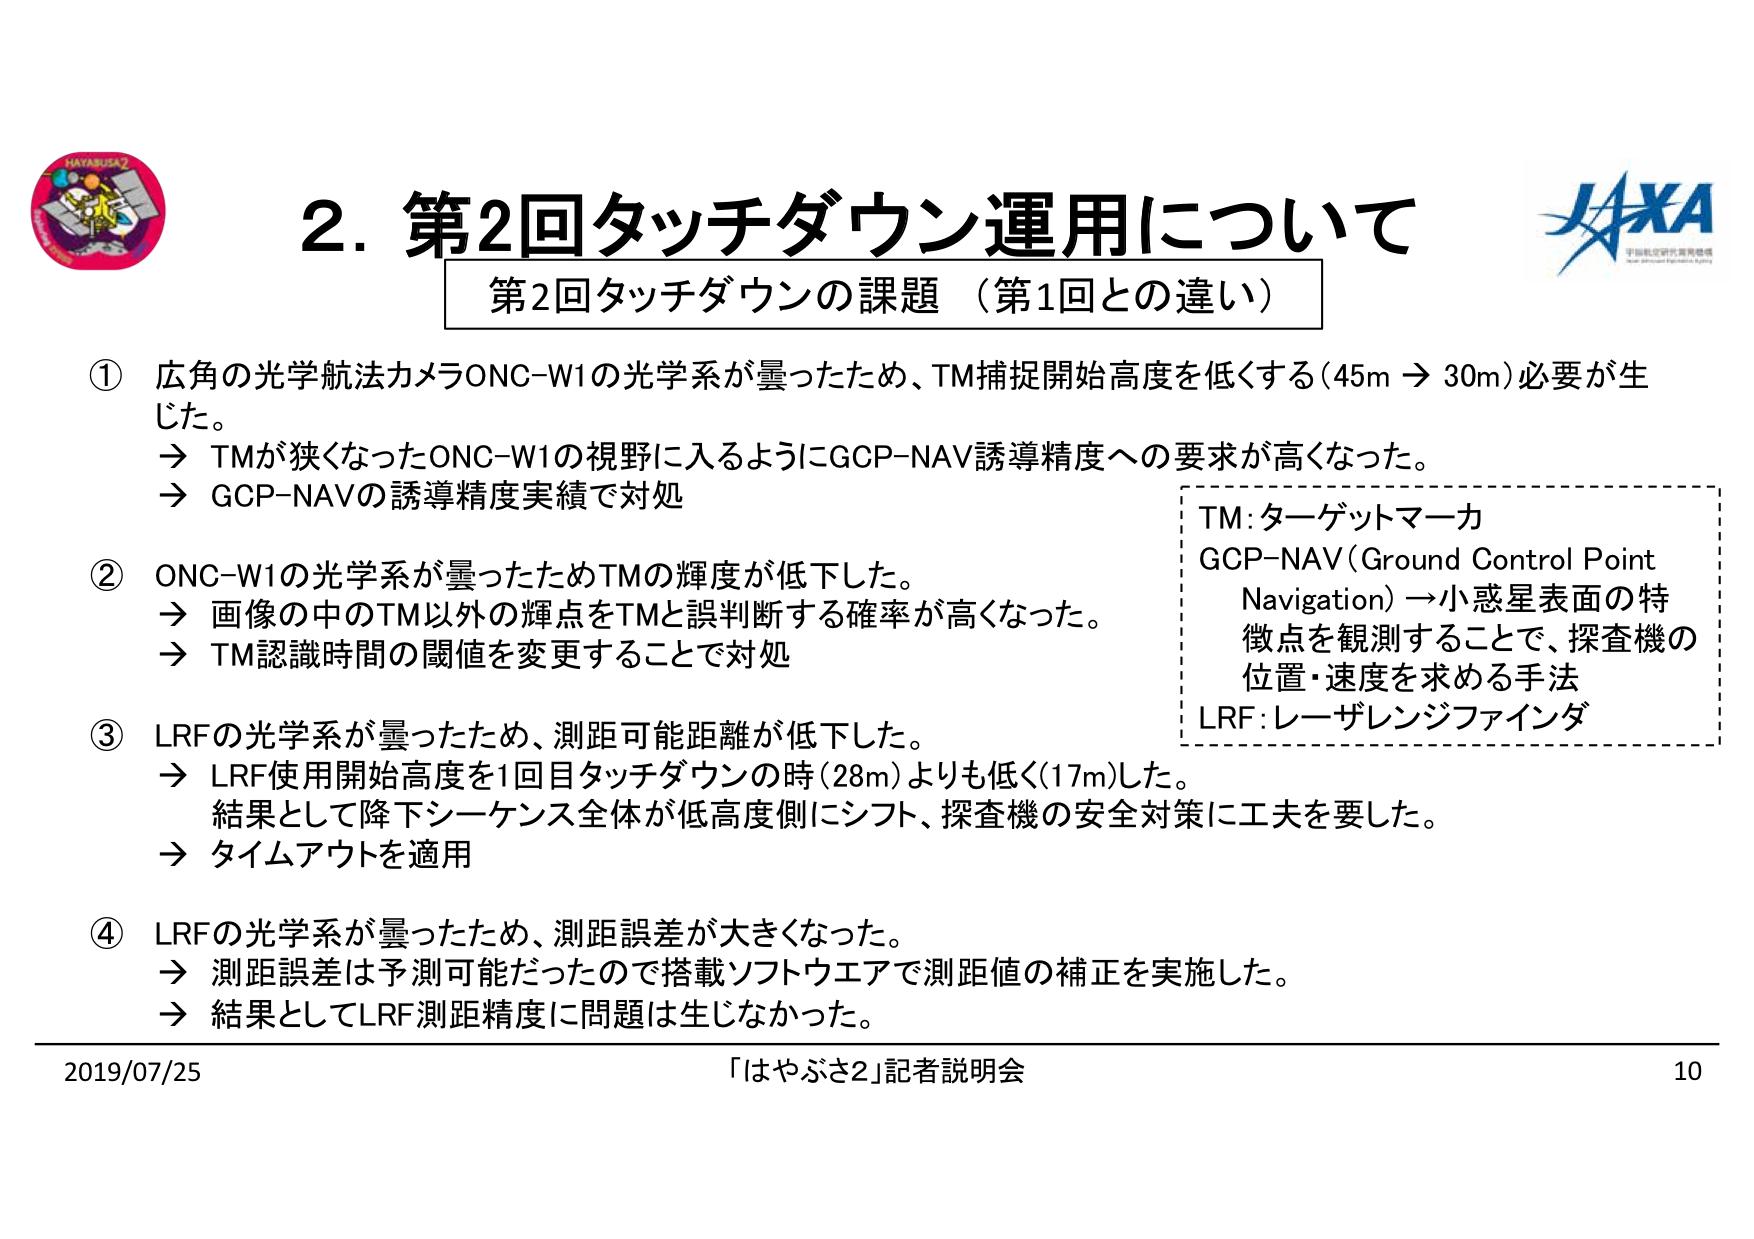 f:id:Imamura:20190725151133p:plain